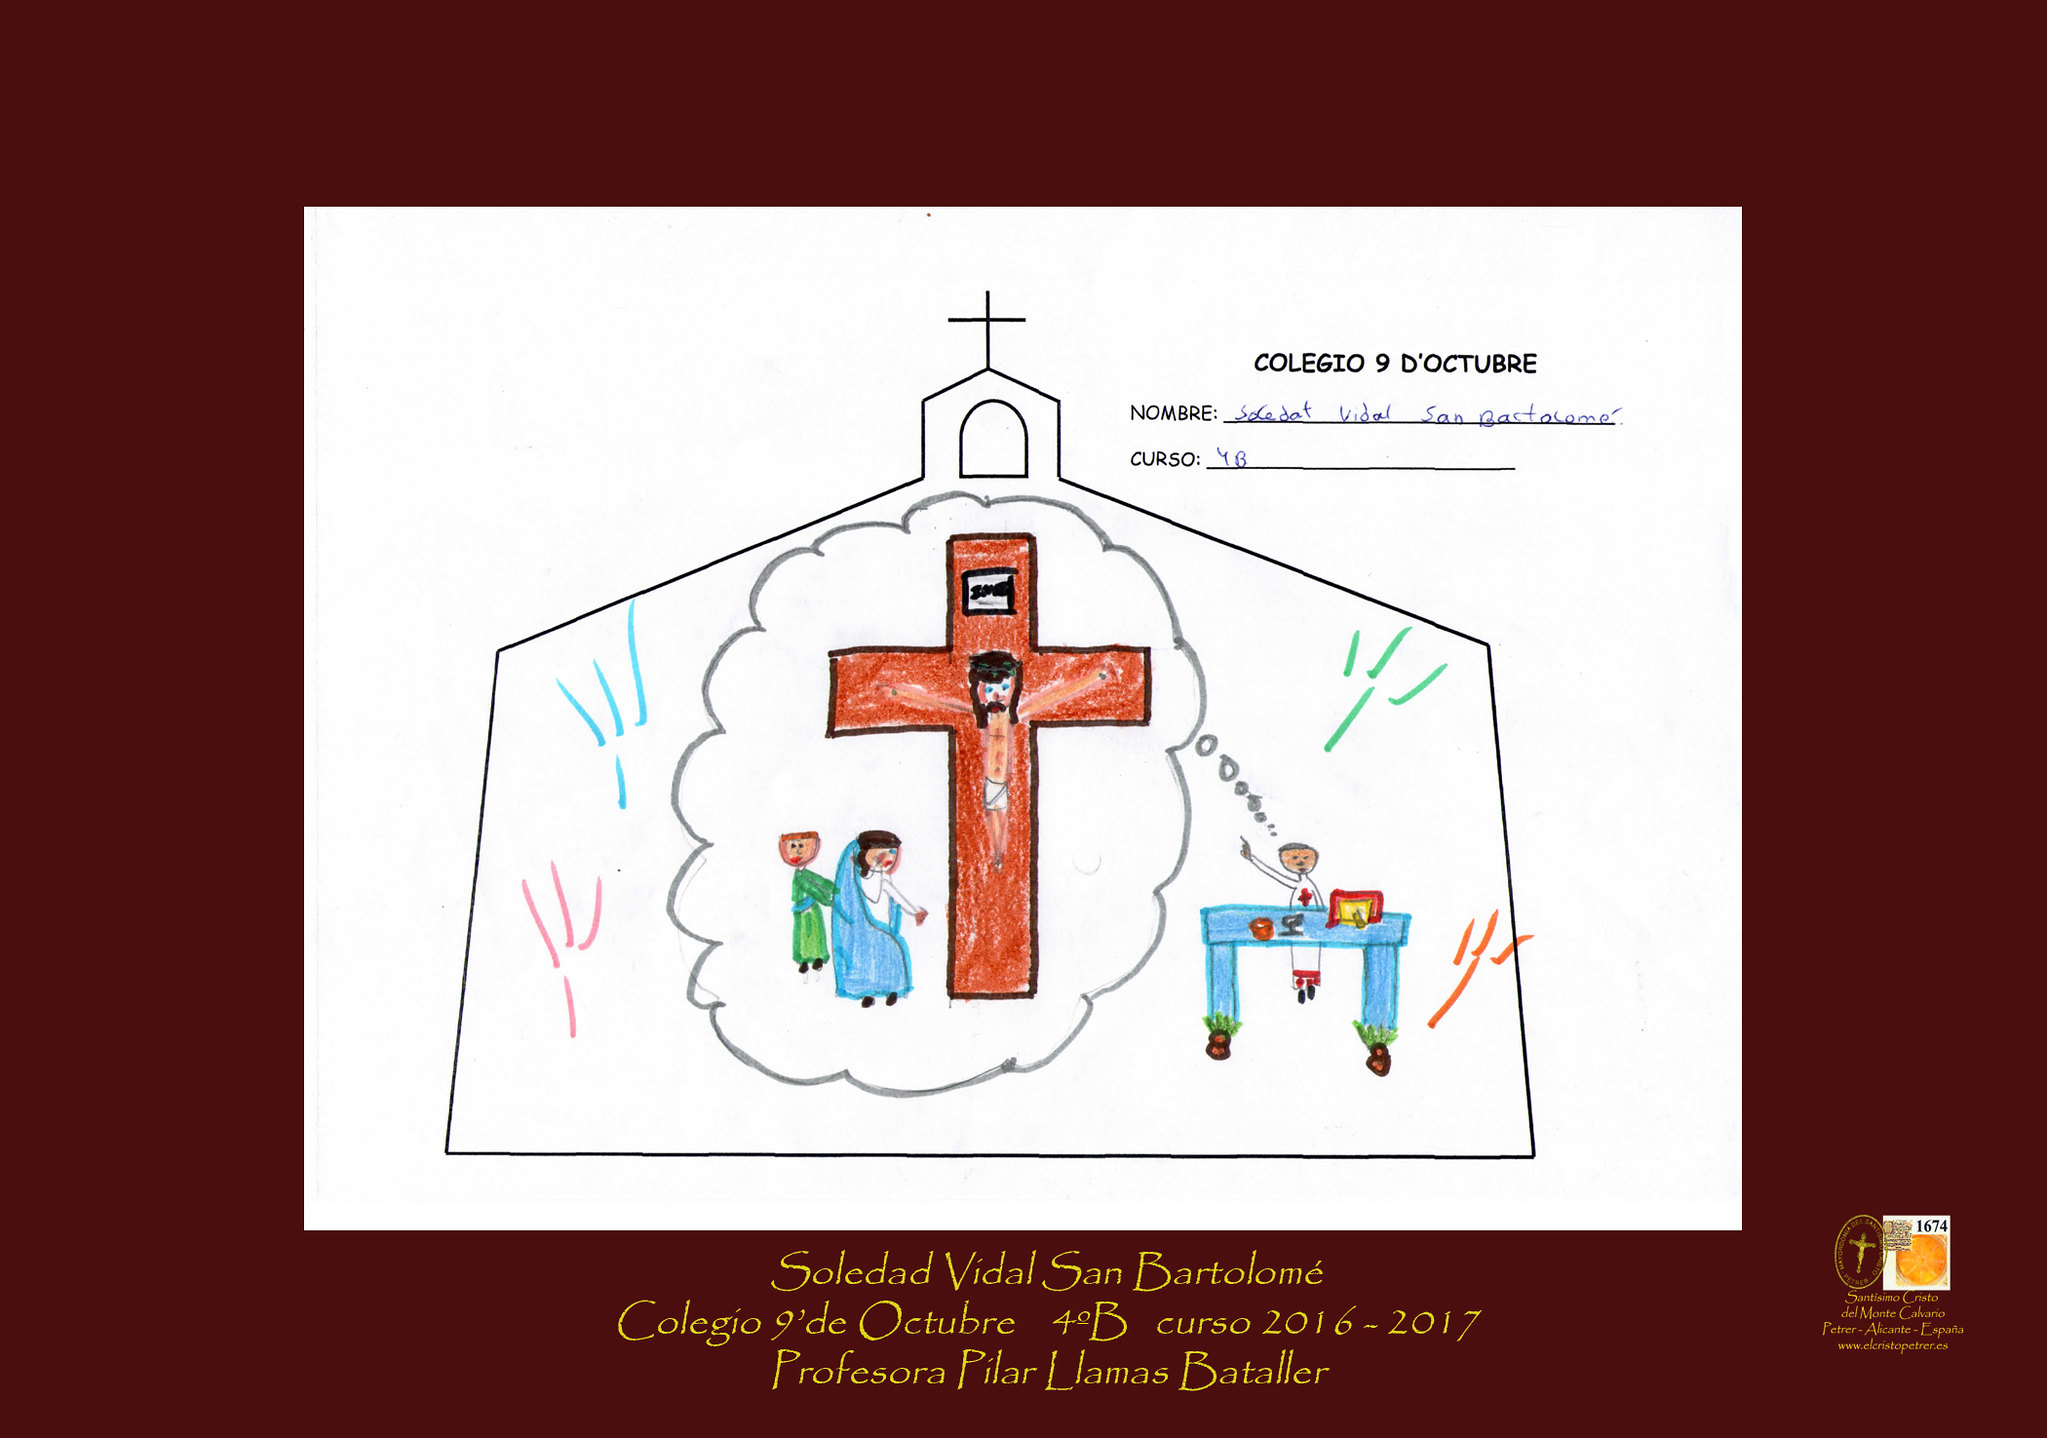 ElCristo - Actos - Exposicion Fotografica - (2017-12-01) - 9 D'Octubre - 4ºB - Vidal San Bartolomé, Soledad